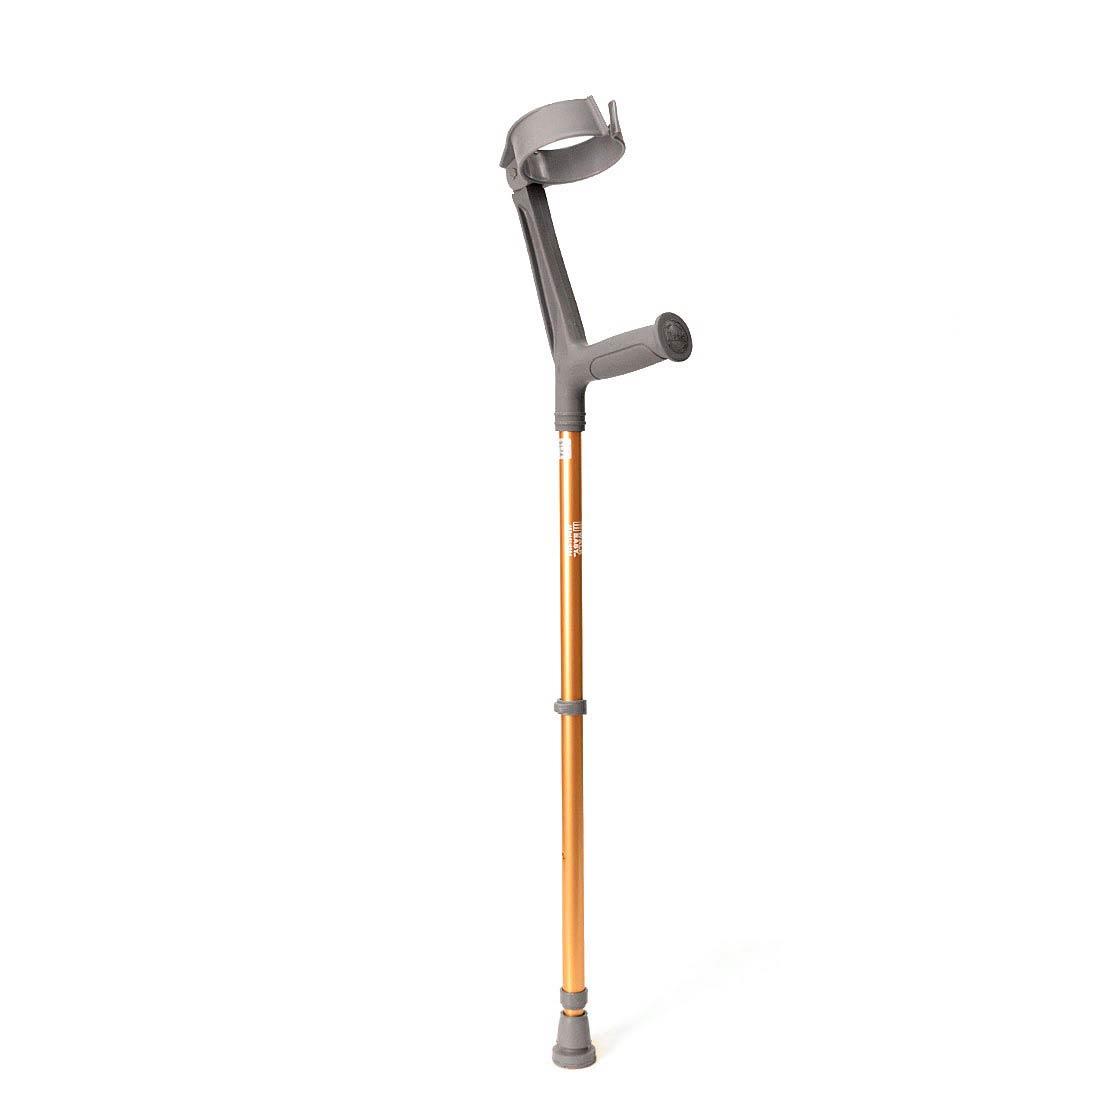 Walk Easy Adult Forearm Articulated Crutch With 4 Inch Full Cuff